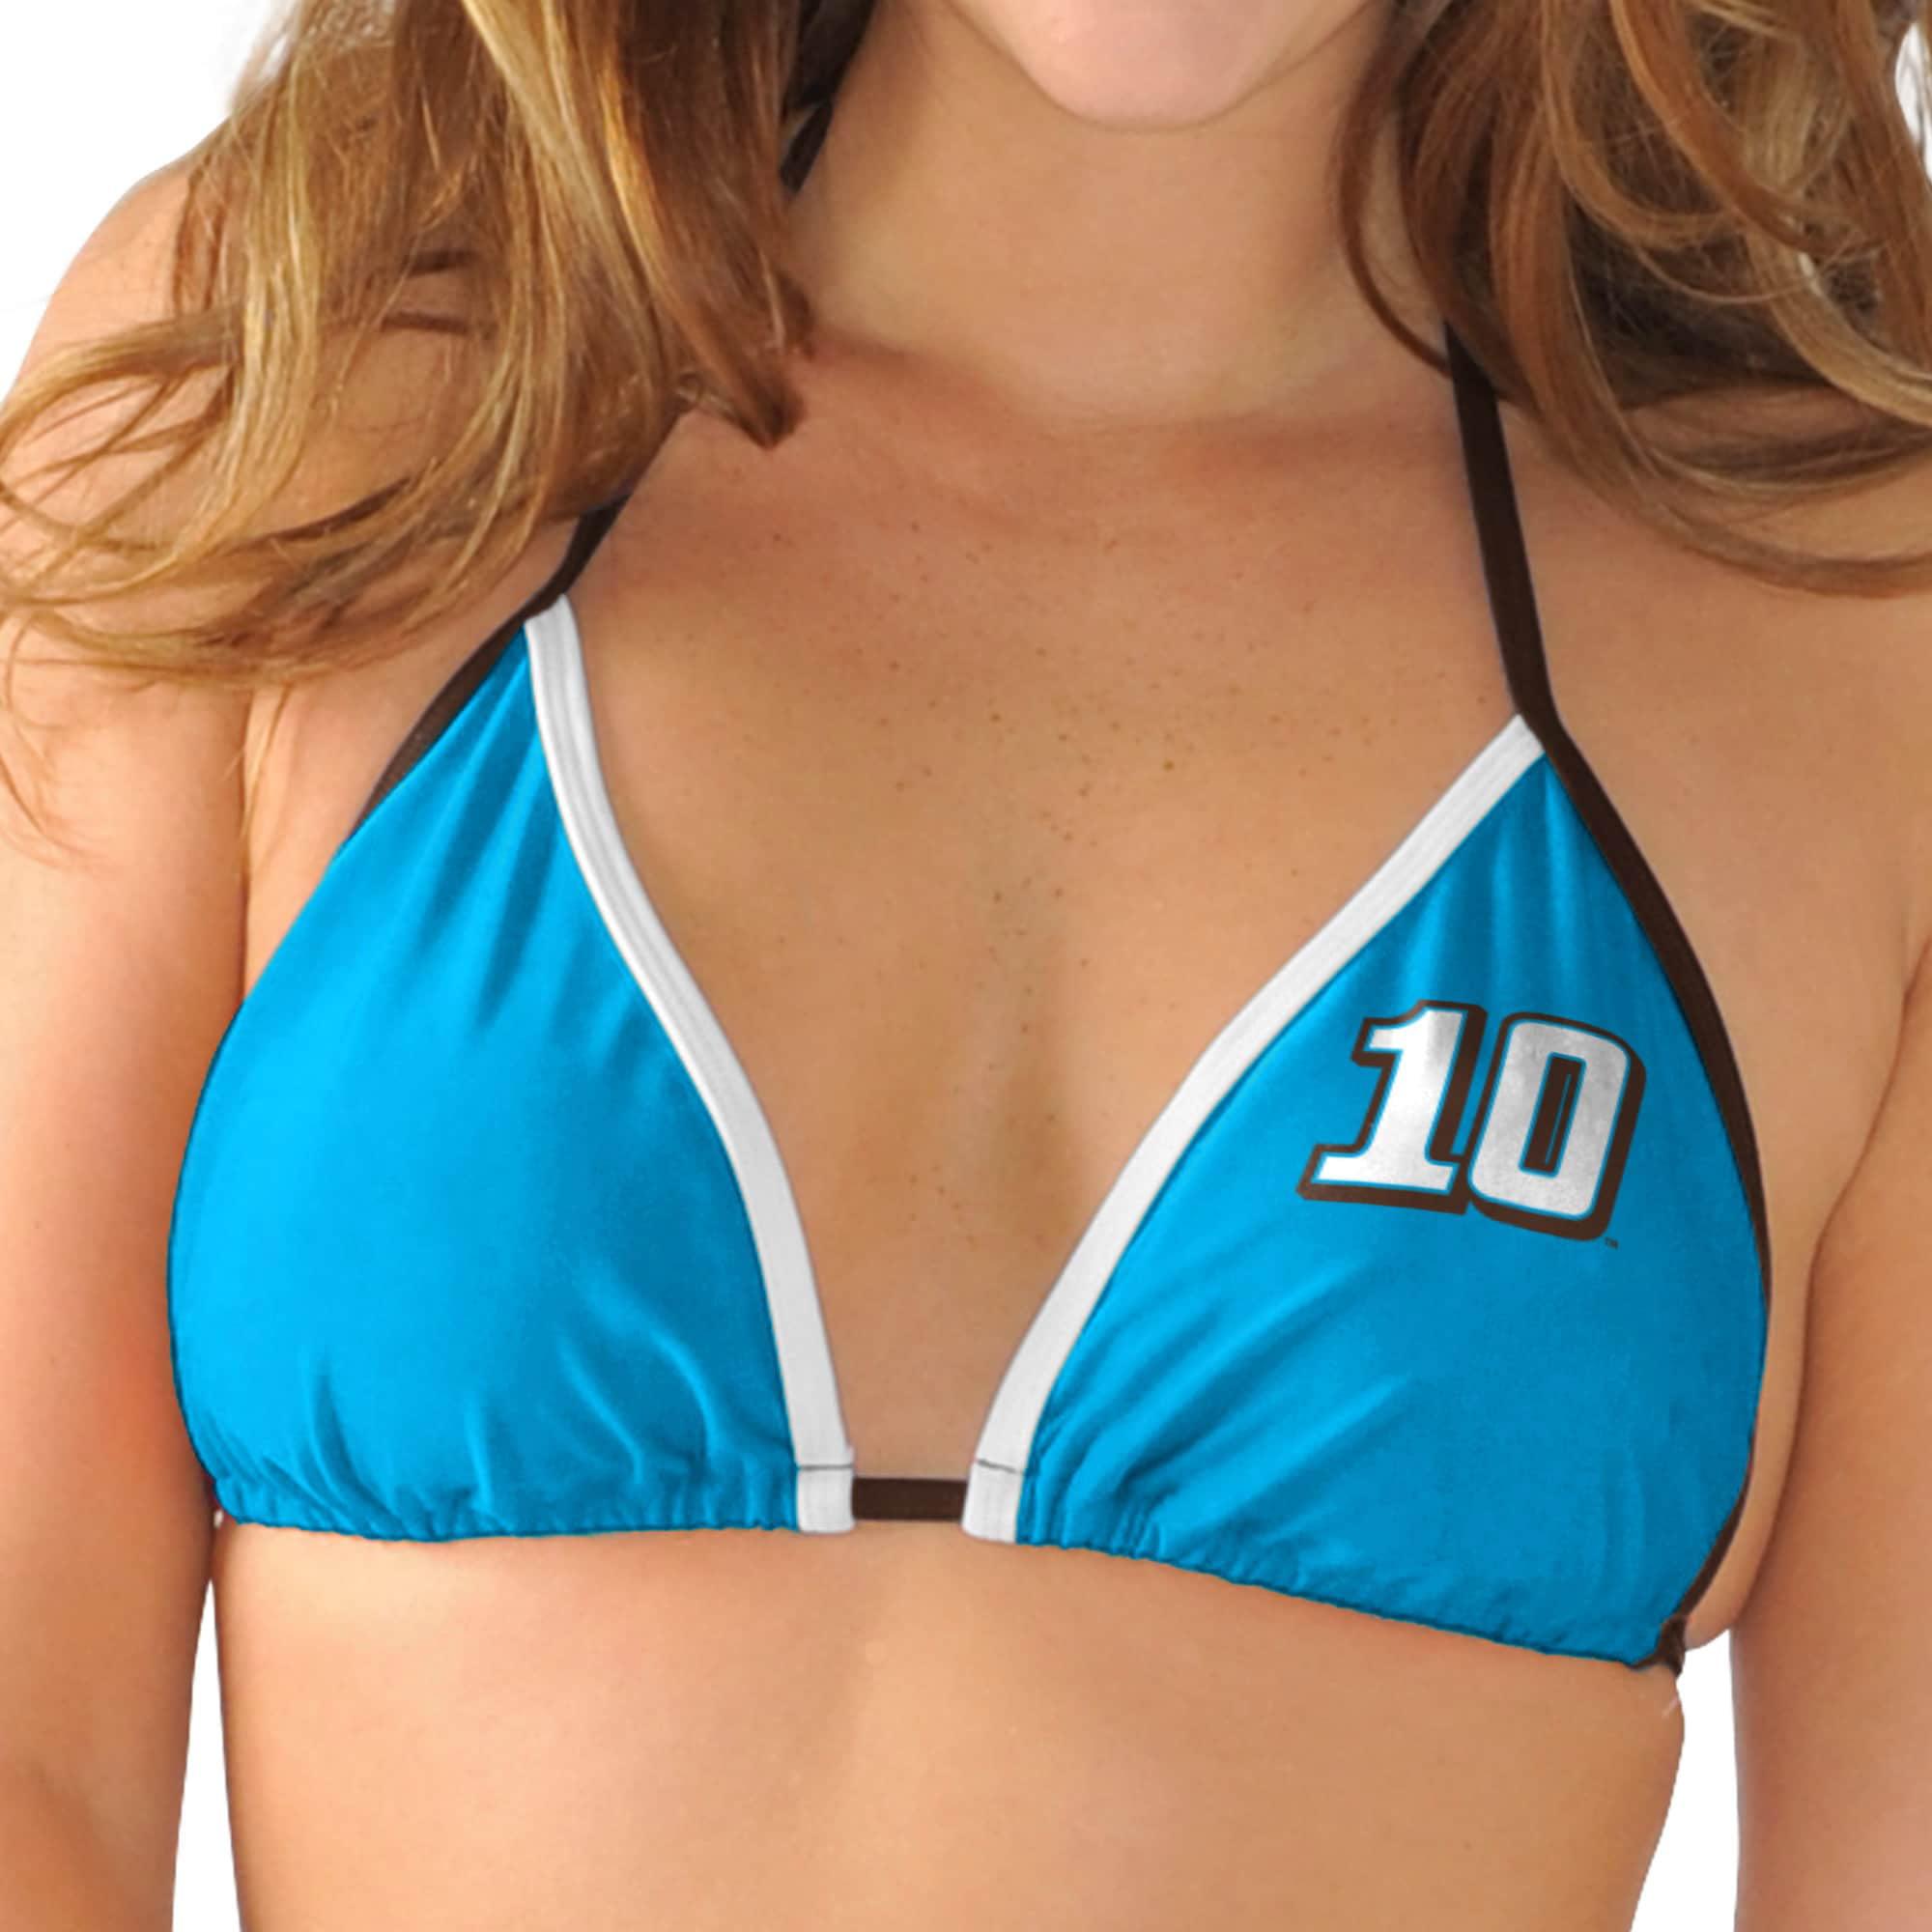 Swimwear > High Tide Bikini in Island Blue